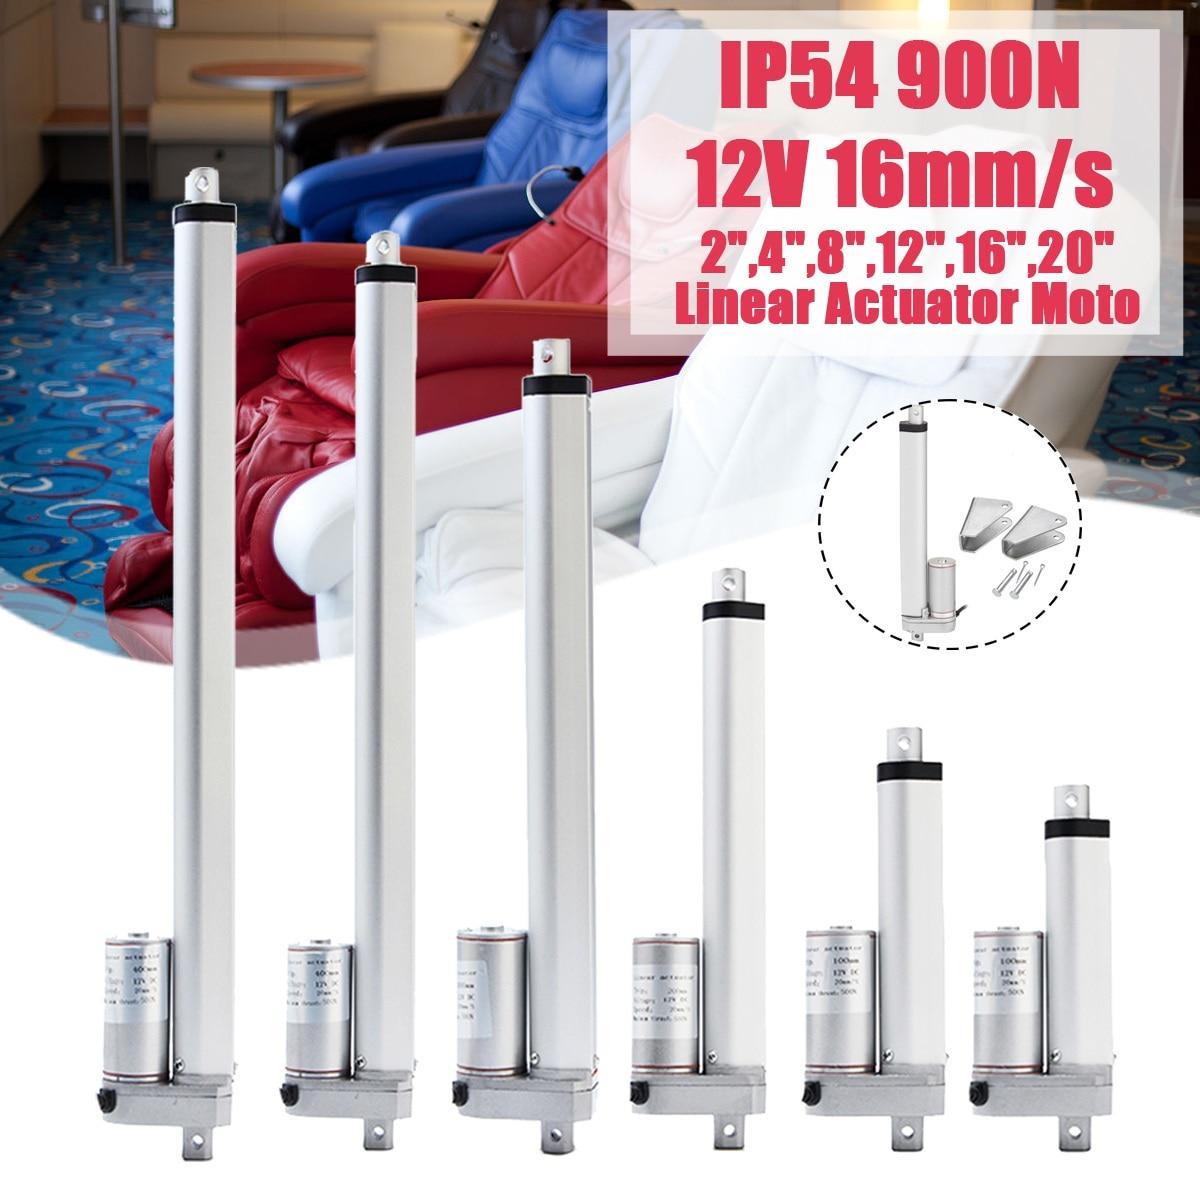 900N 2 4 8 12 16 20 بوصة 12V 16 مللي متر/ثانية صغيرة DC الكهربائية دفع قضيب الأبيض المواد سبائك الألومنيوم المحرك الخطي